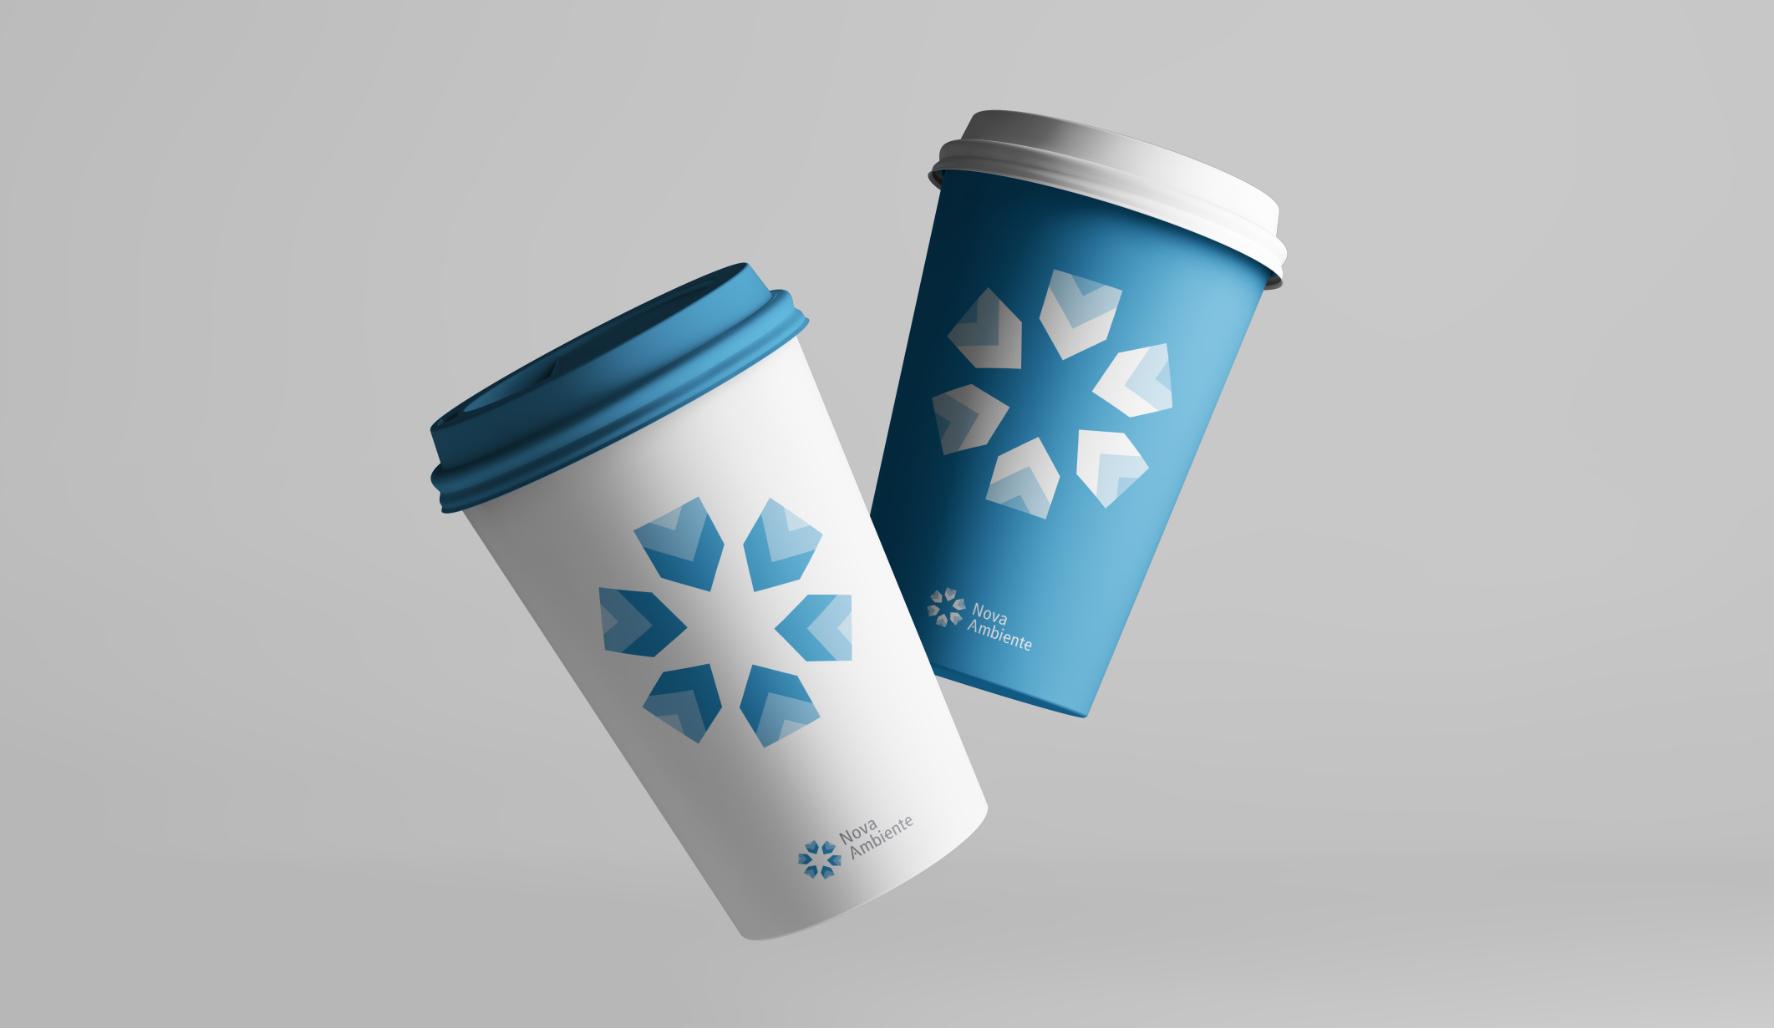 Nova-Ambiente brand identity design